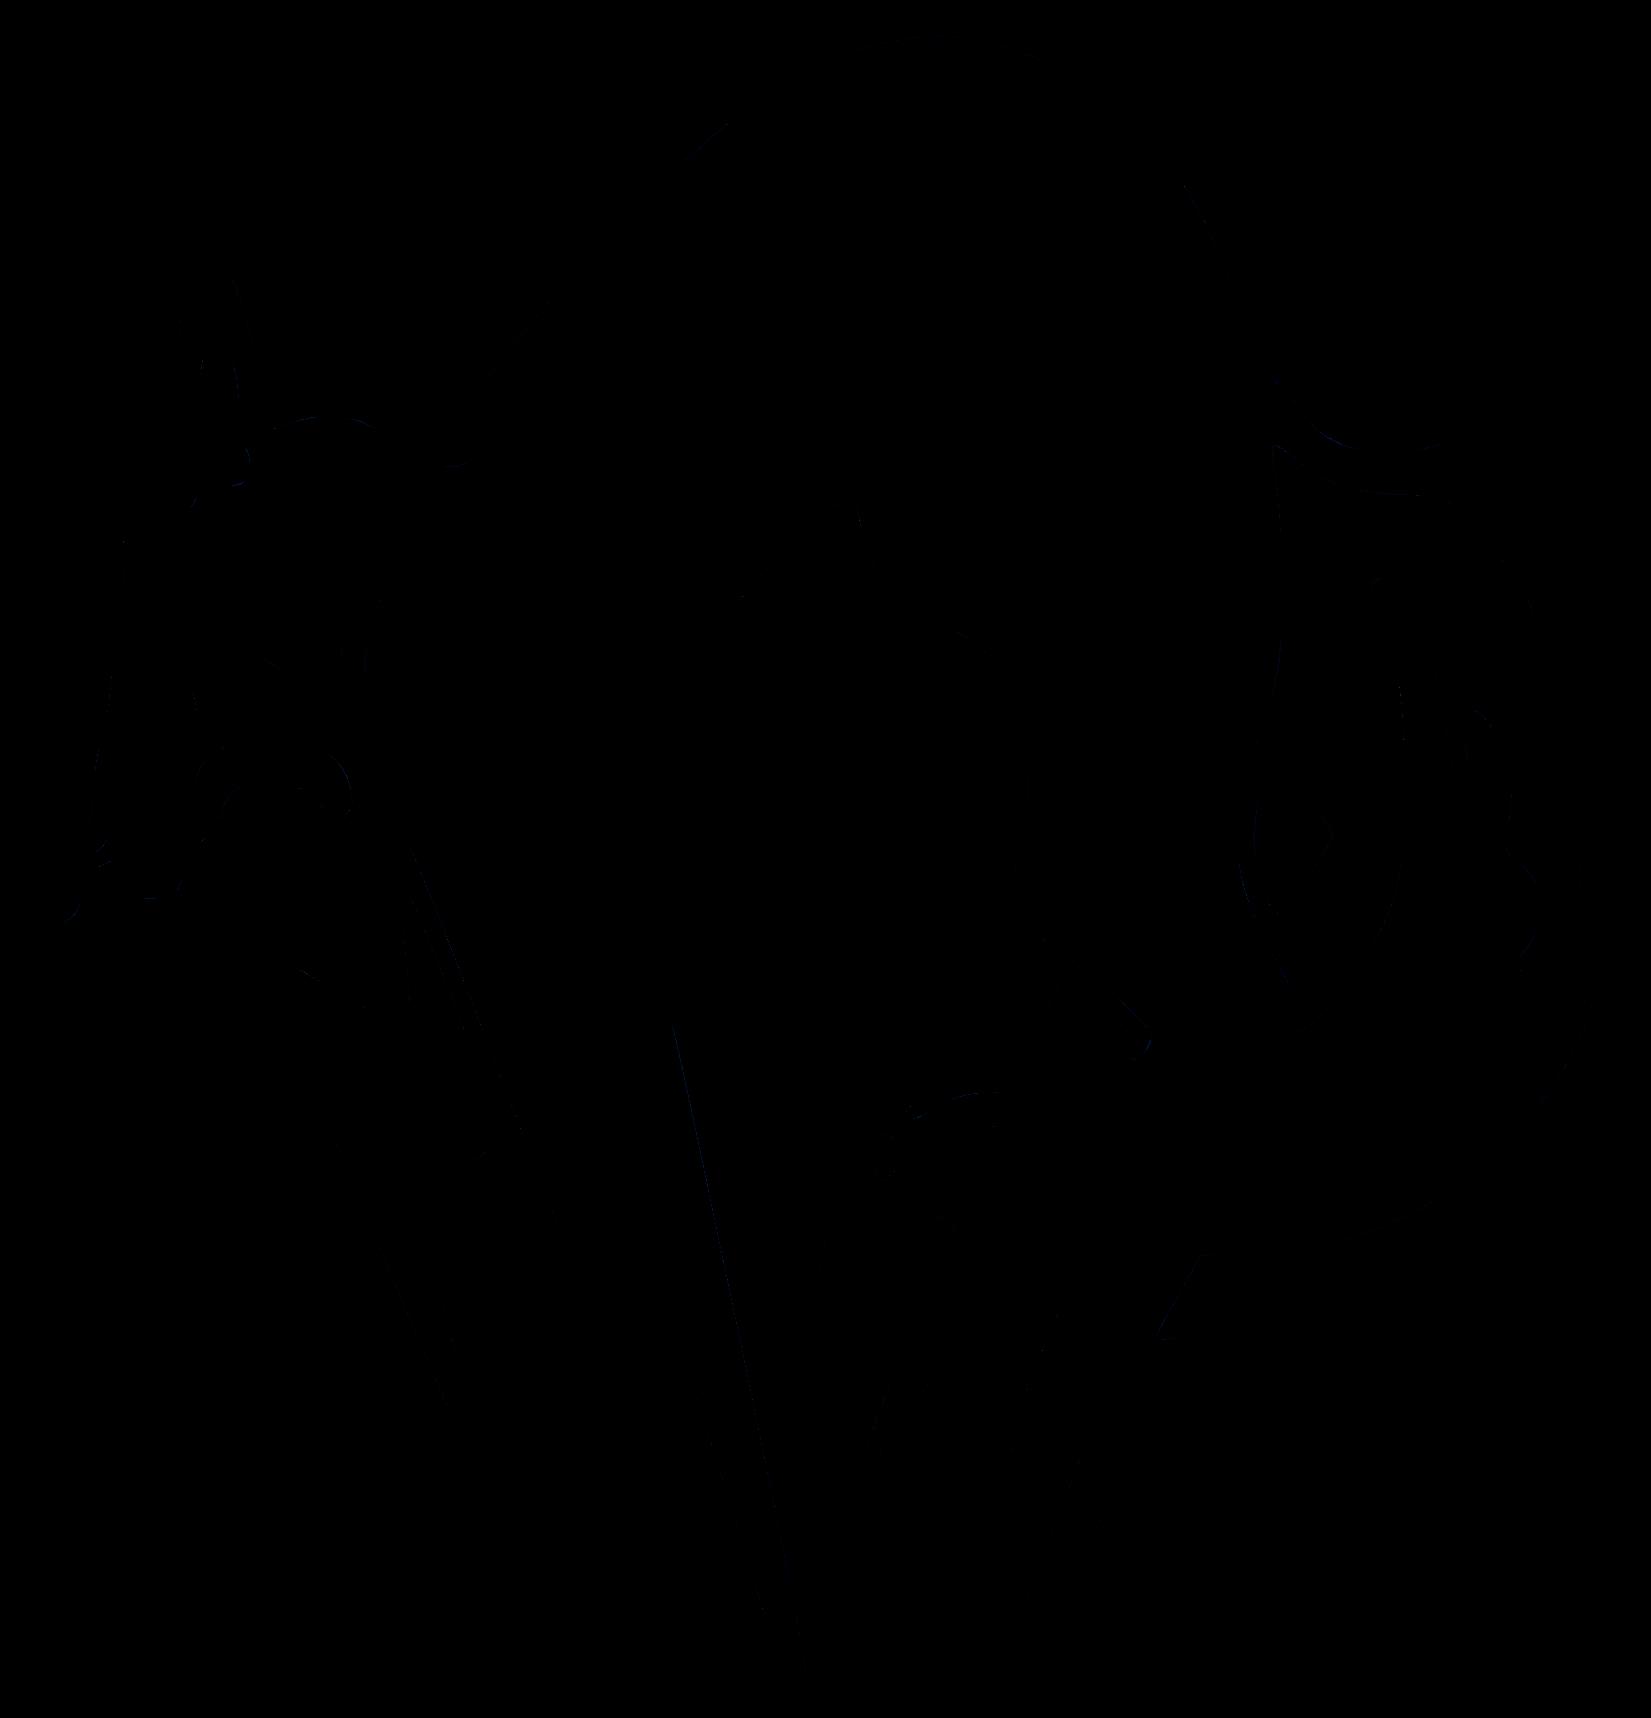 Foxhound Logo Tattoo